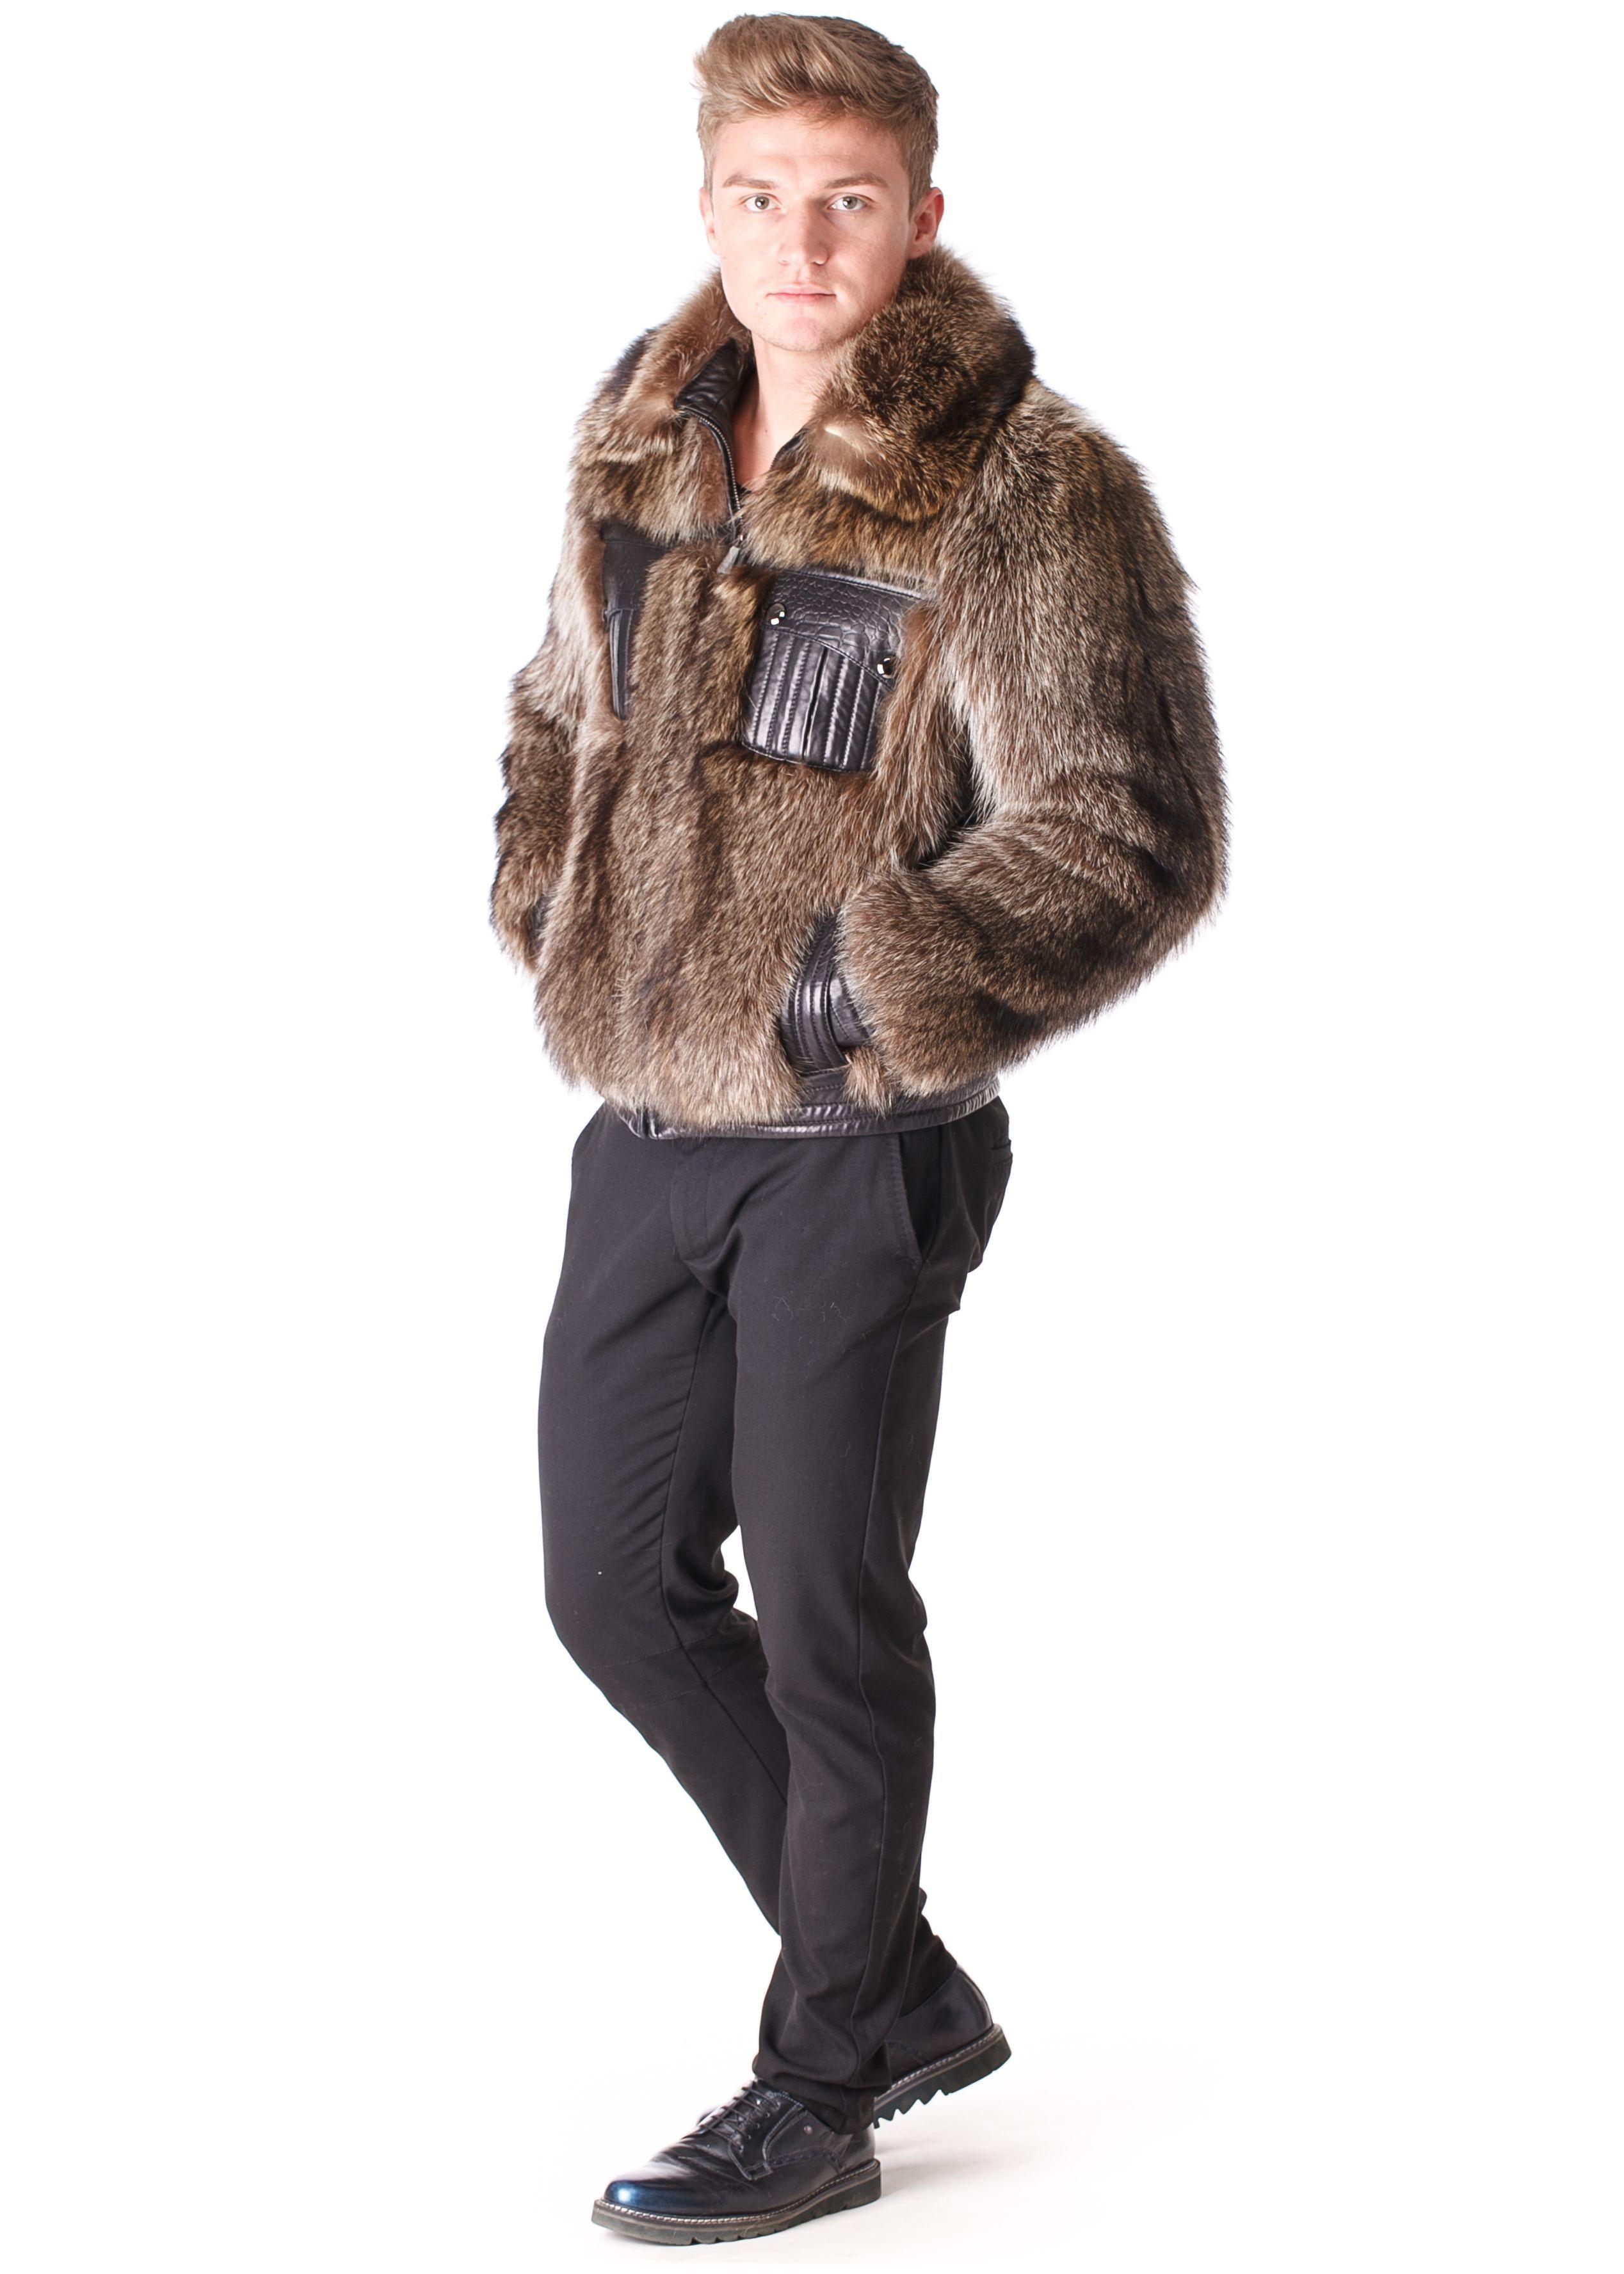 Man in Leather Fur Jacket Fur leather jacket, Fur hood